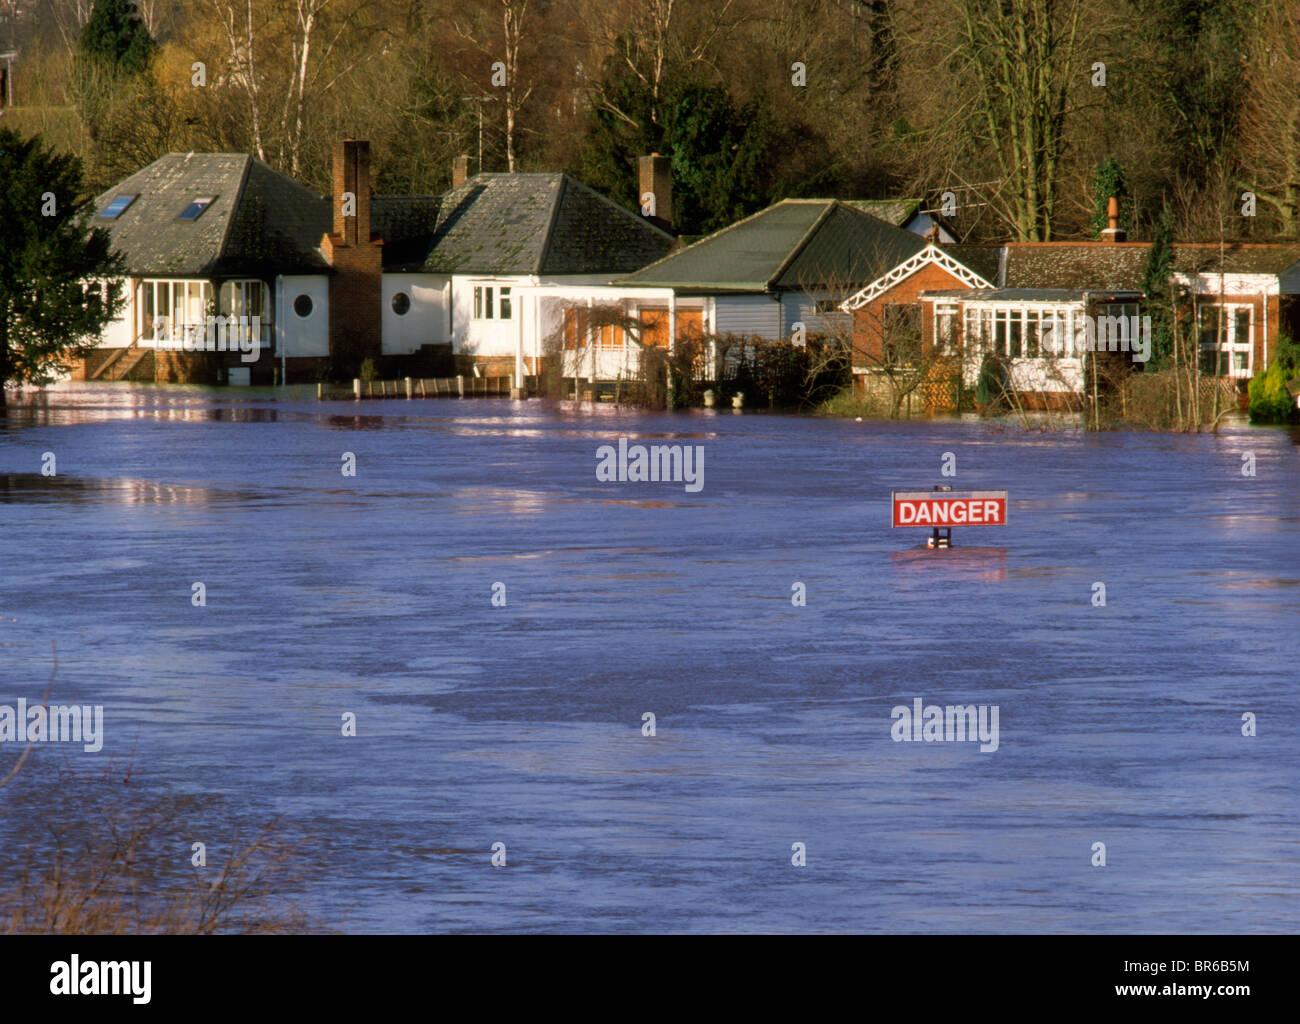 England Buckinghamshire Marlow Thames Floods - Stock Image